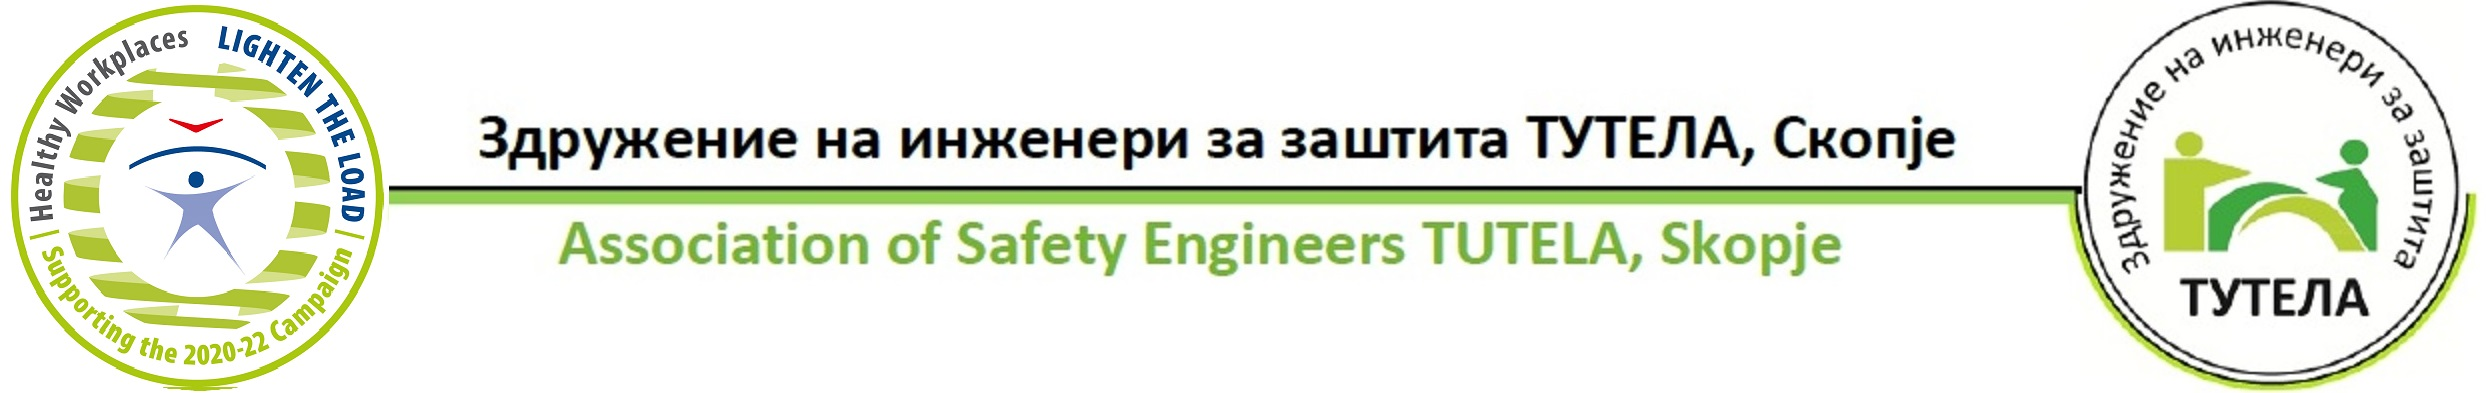 Здружение на инженери за заштита ТУТЕЛА / Association of Safety Engineers TUTELA